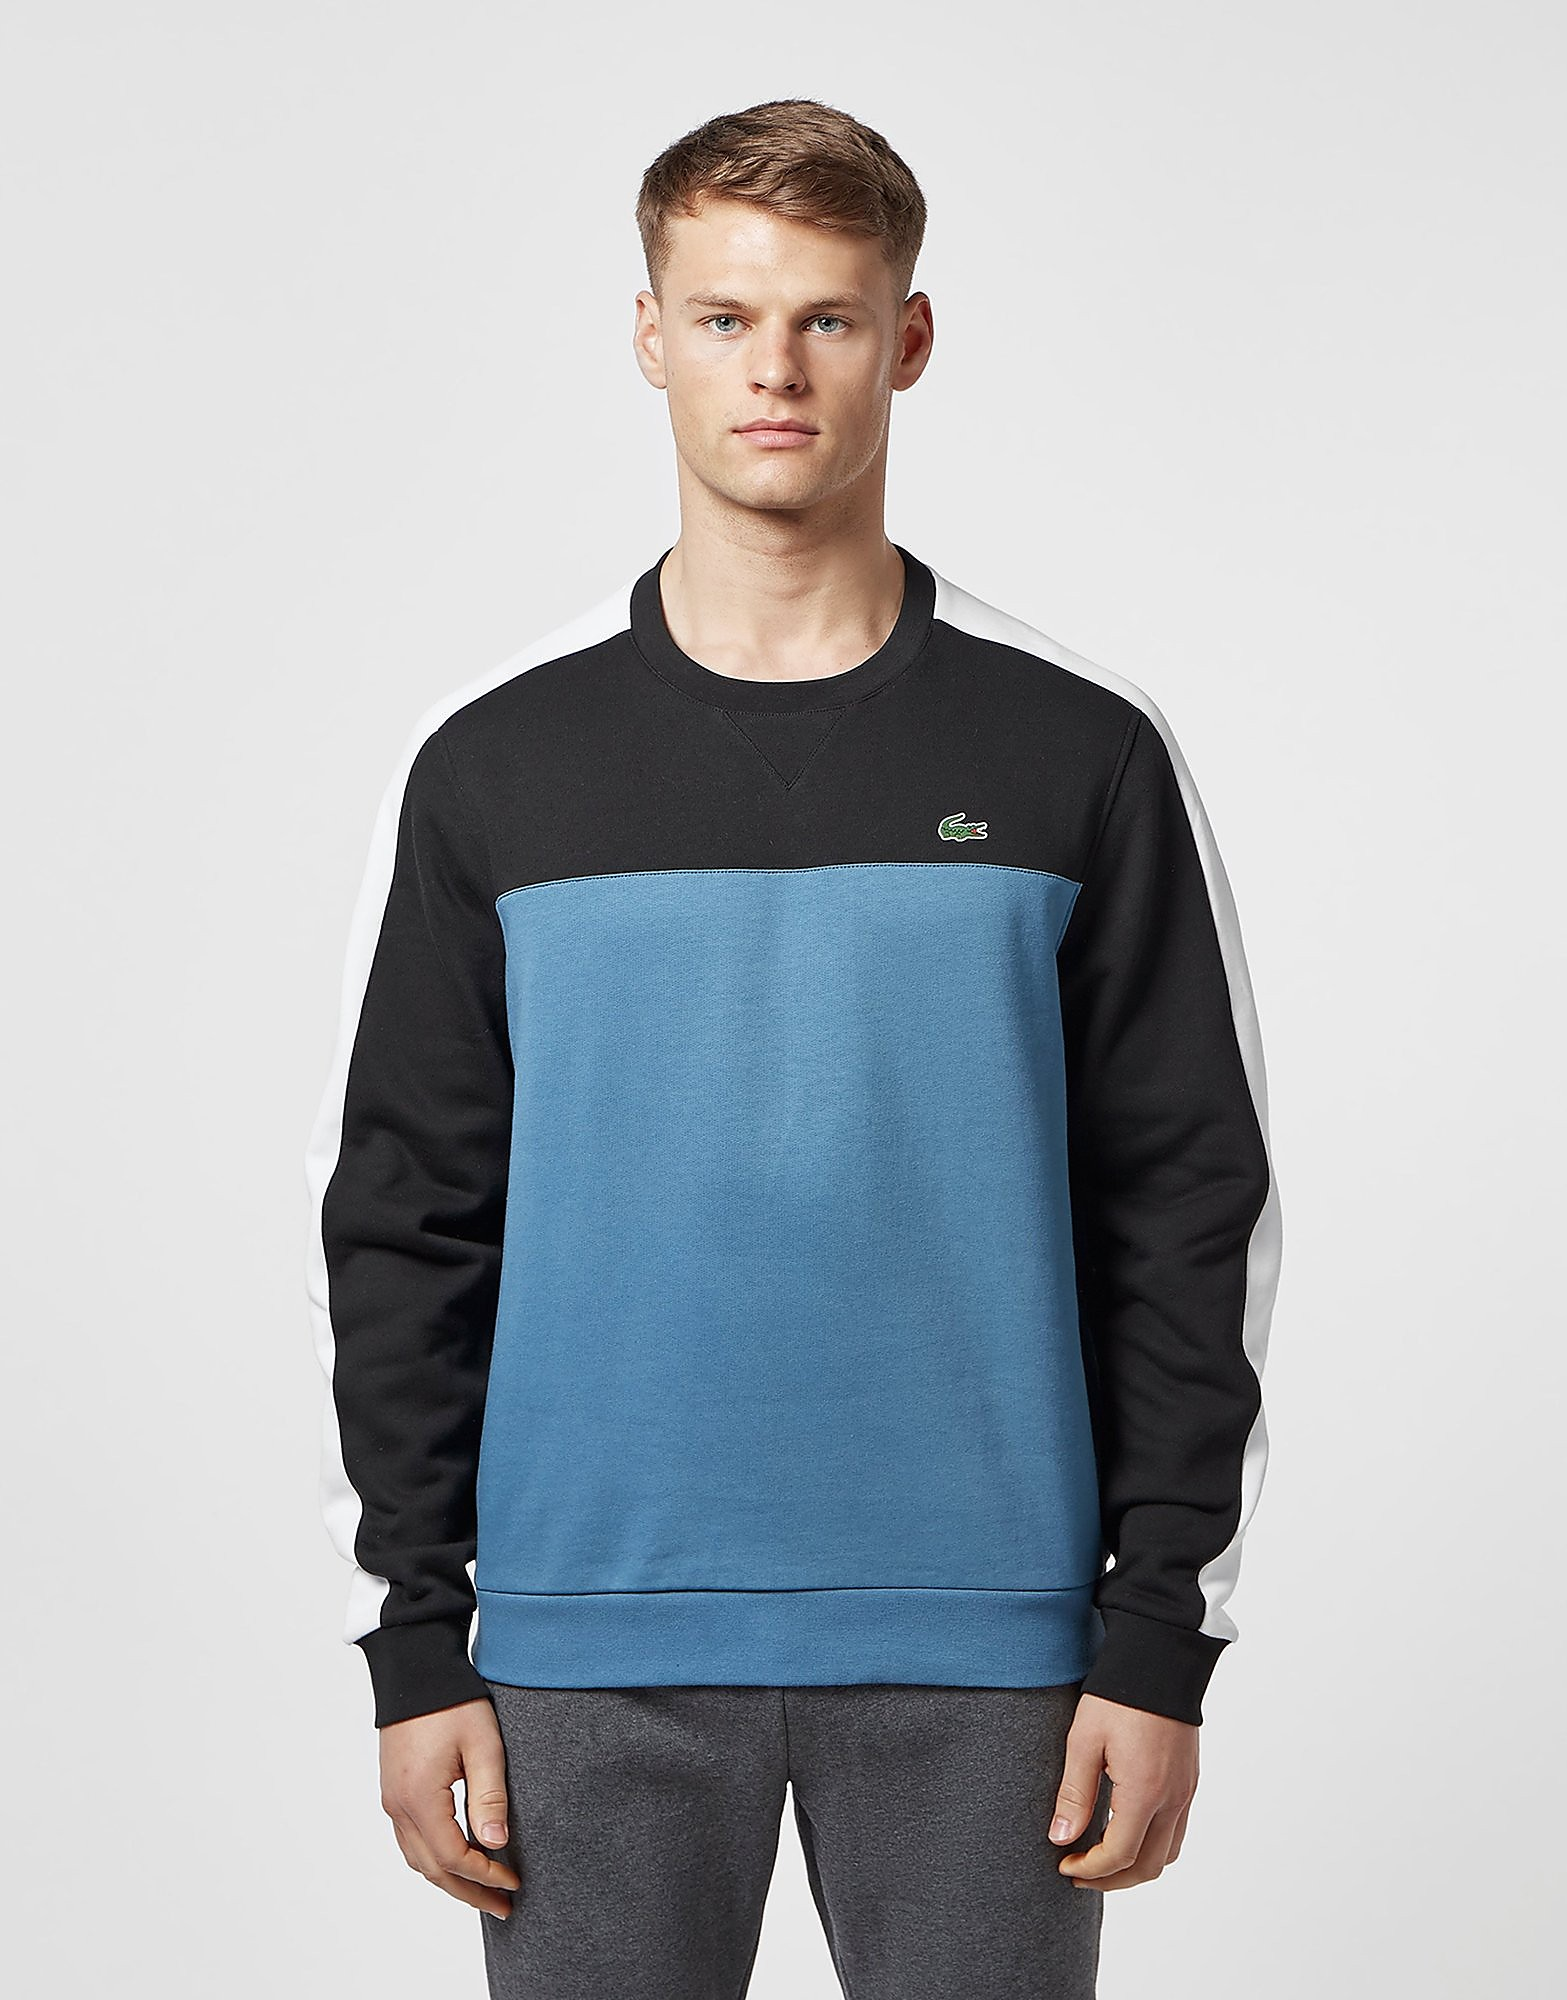 Lacoste Colour Block Crew Sweatshirt